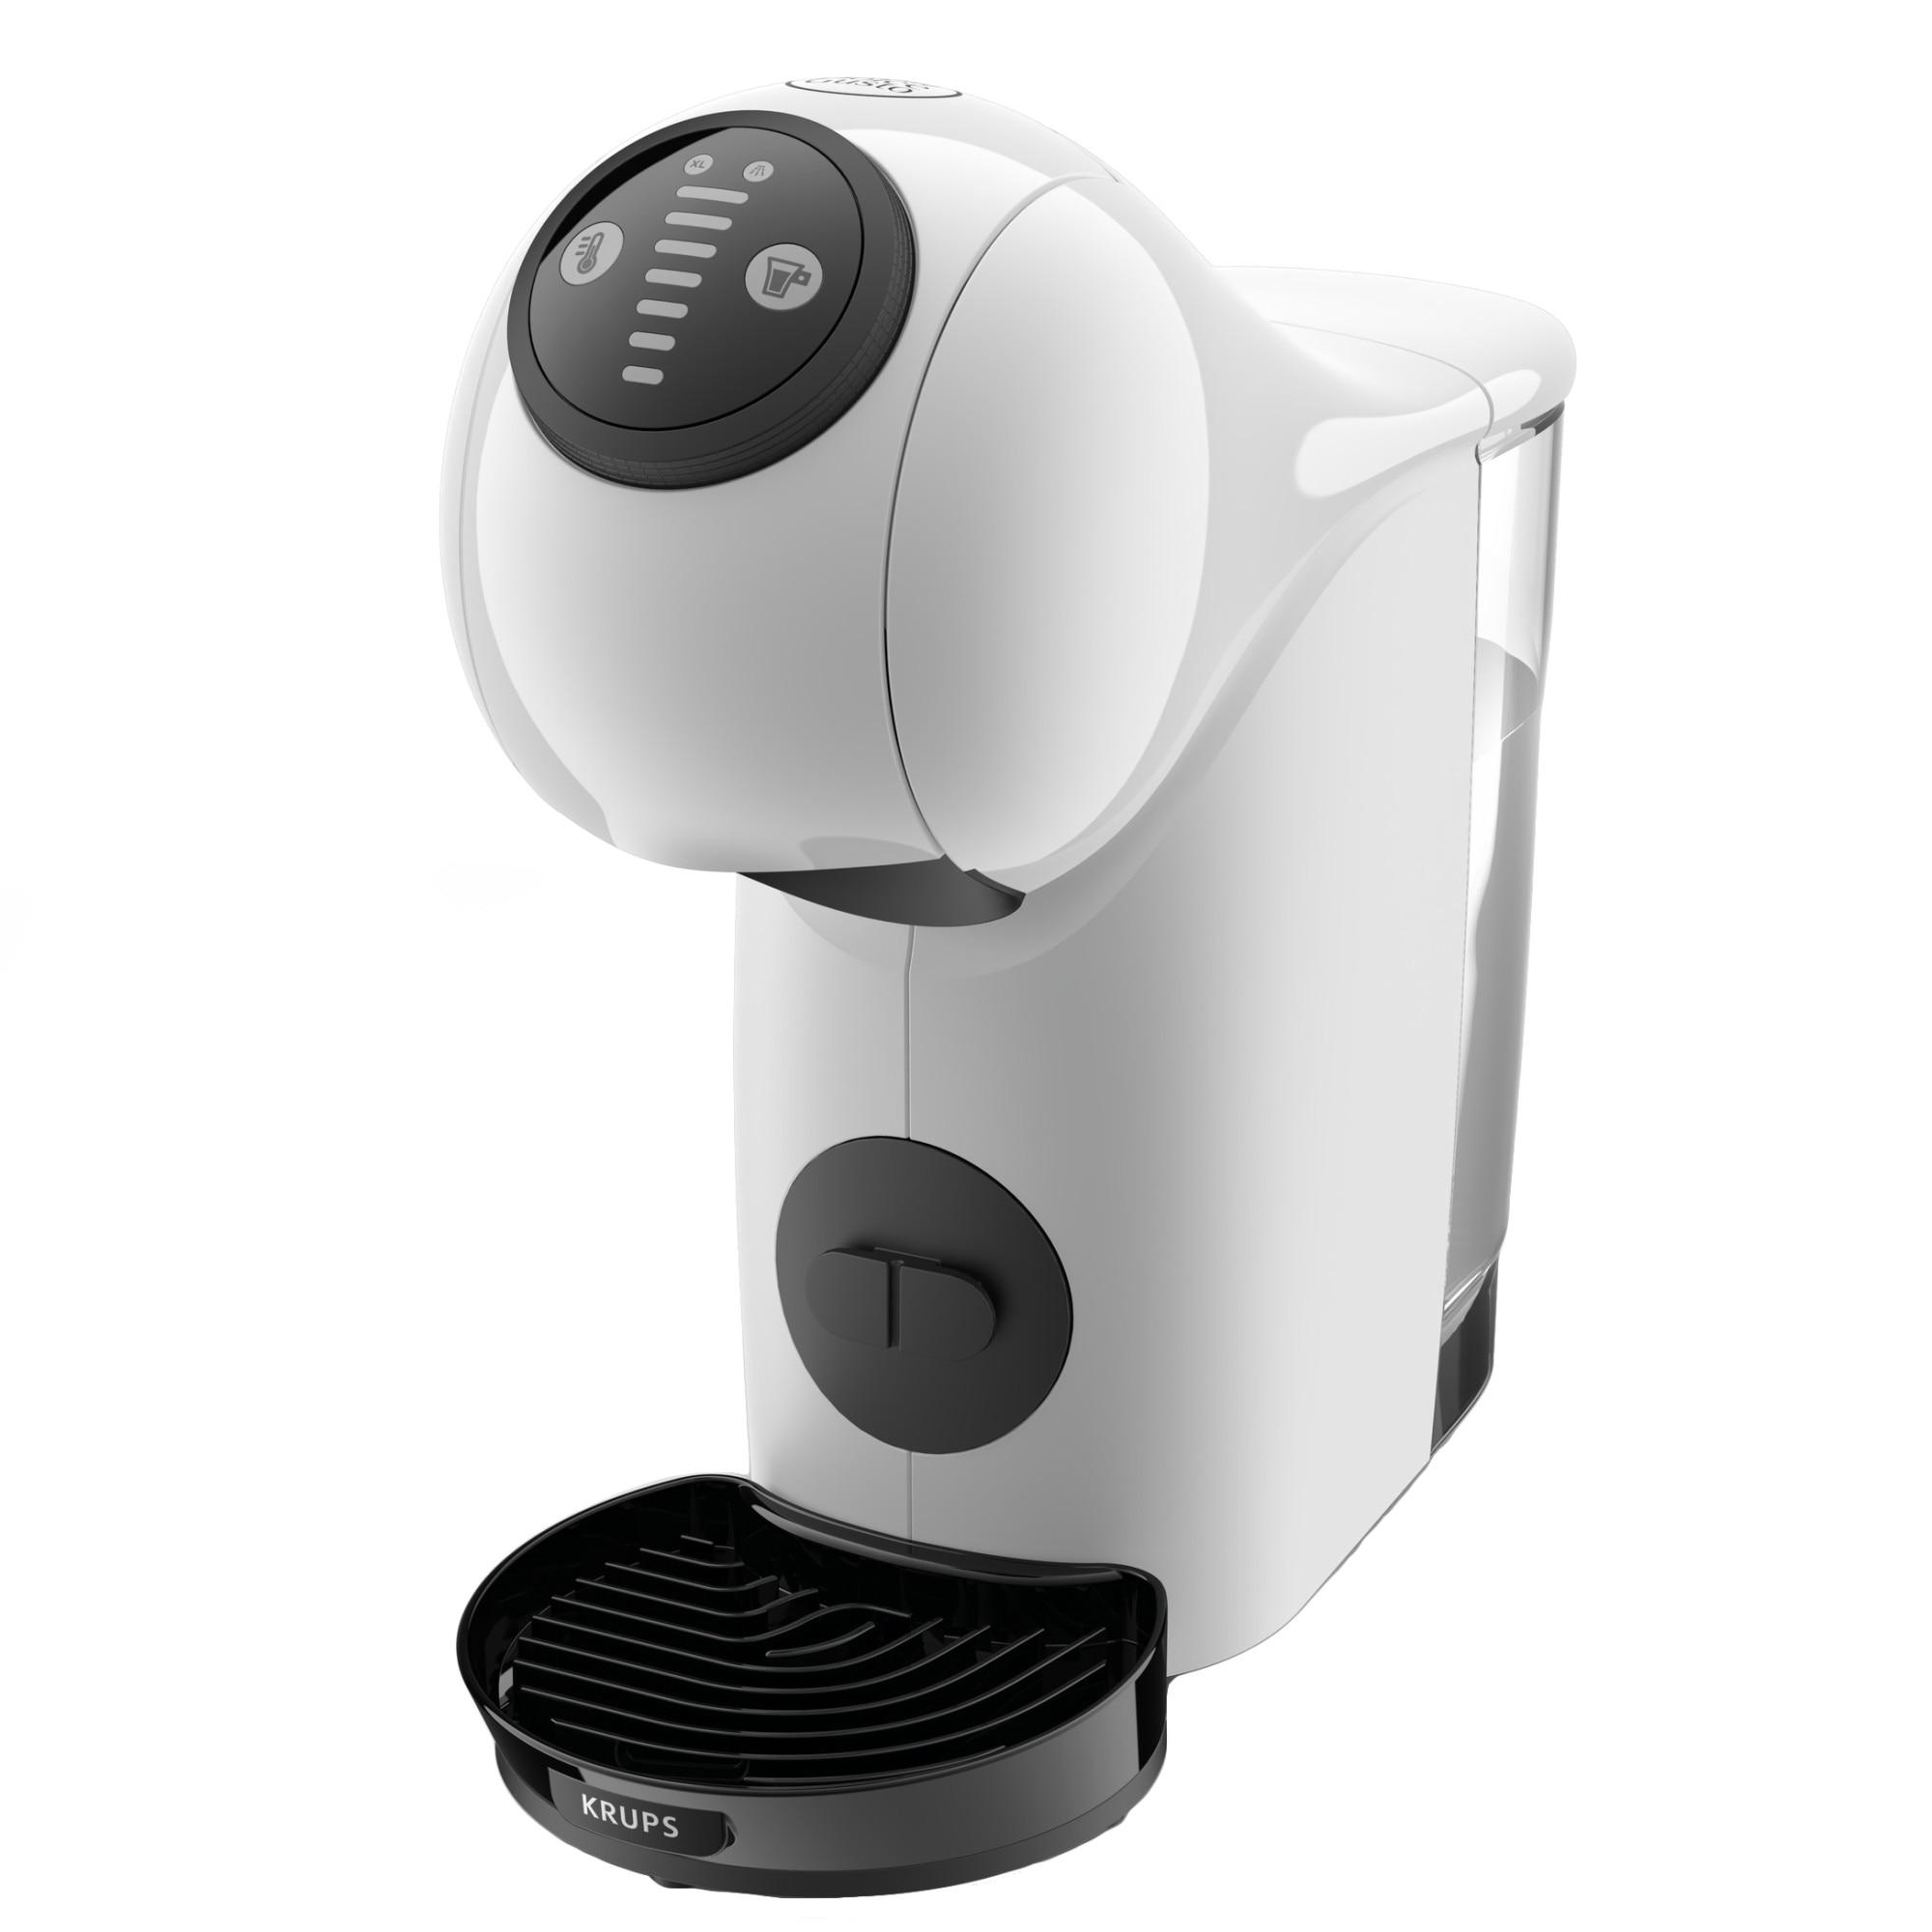 Fotografie Espressor cu capsule Krups NESCAFÉ® Dolce Gusto® Genio S KP240131, 1500 W, 15 bari, Play&Select, functie XL 300ml, rezervor 0.8L, alb